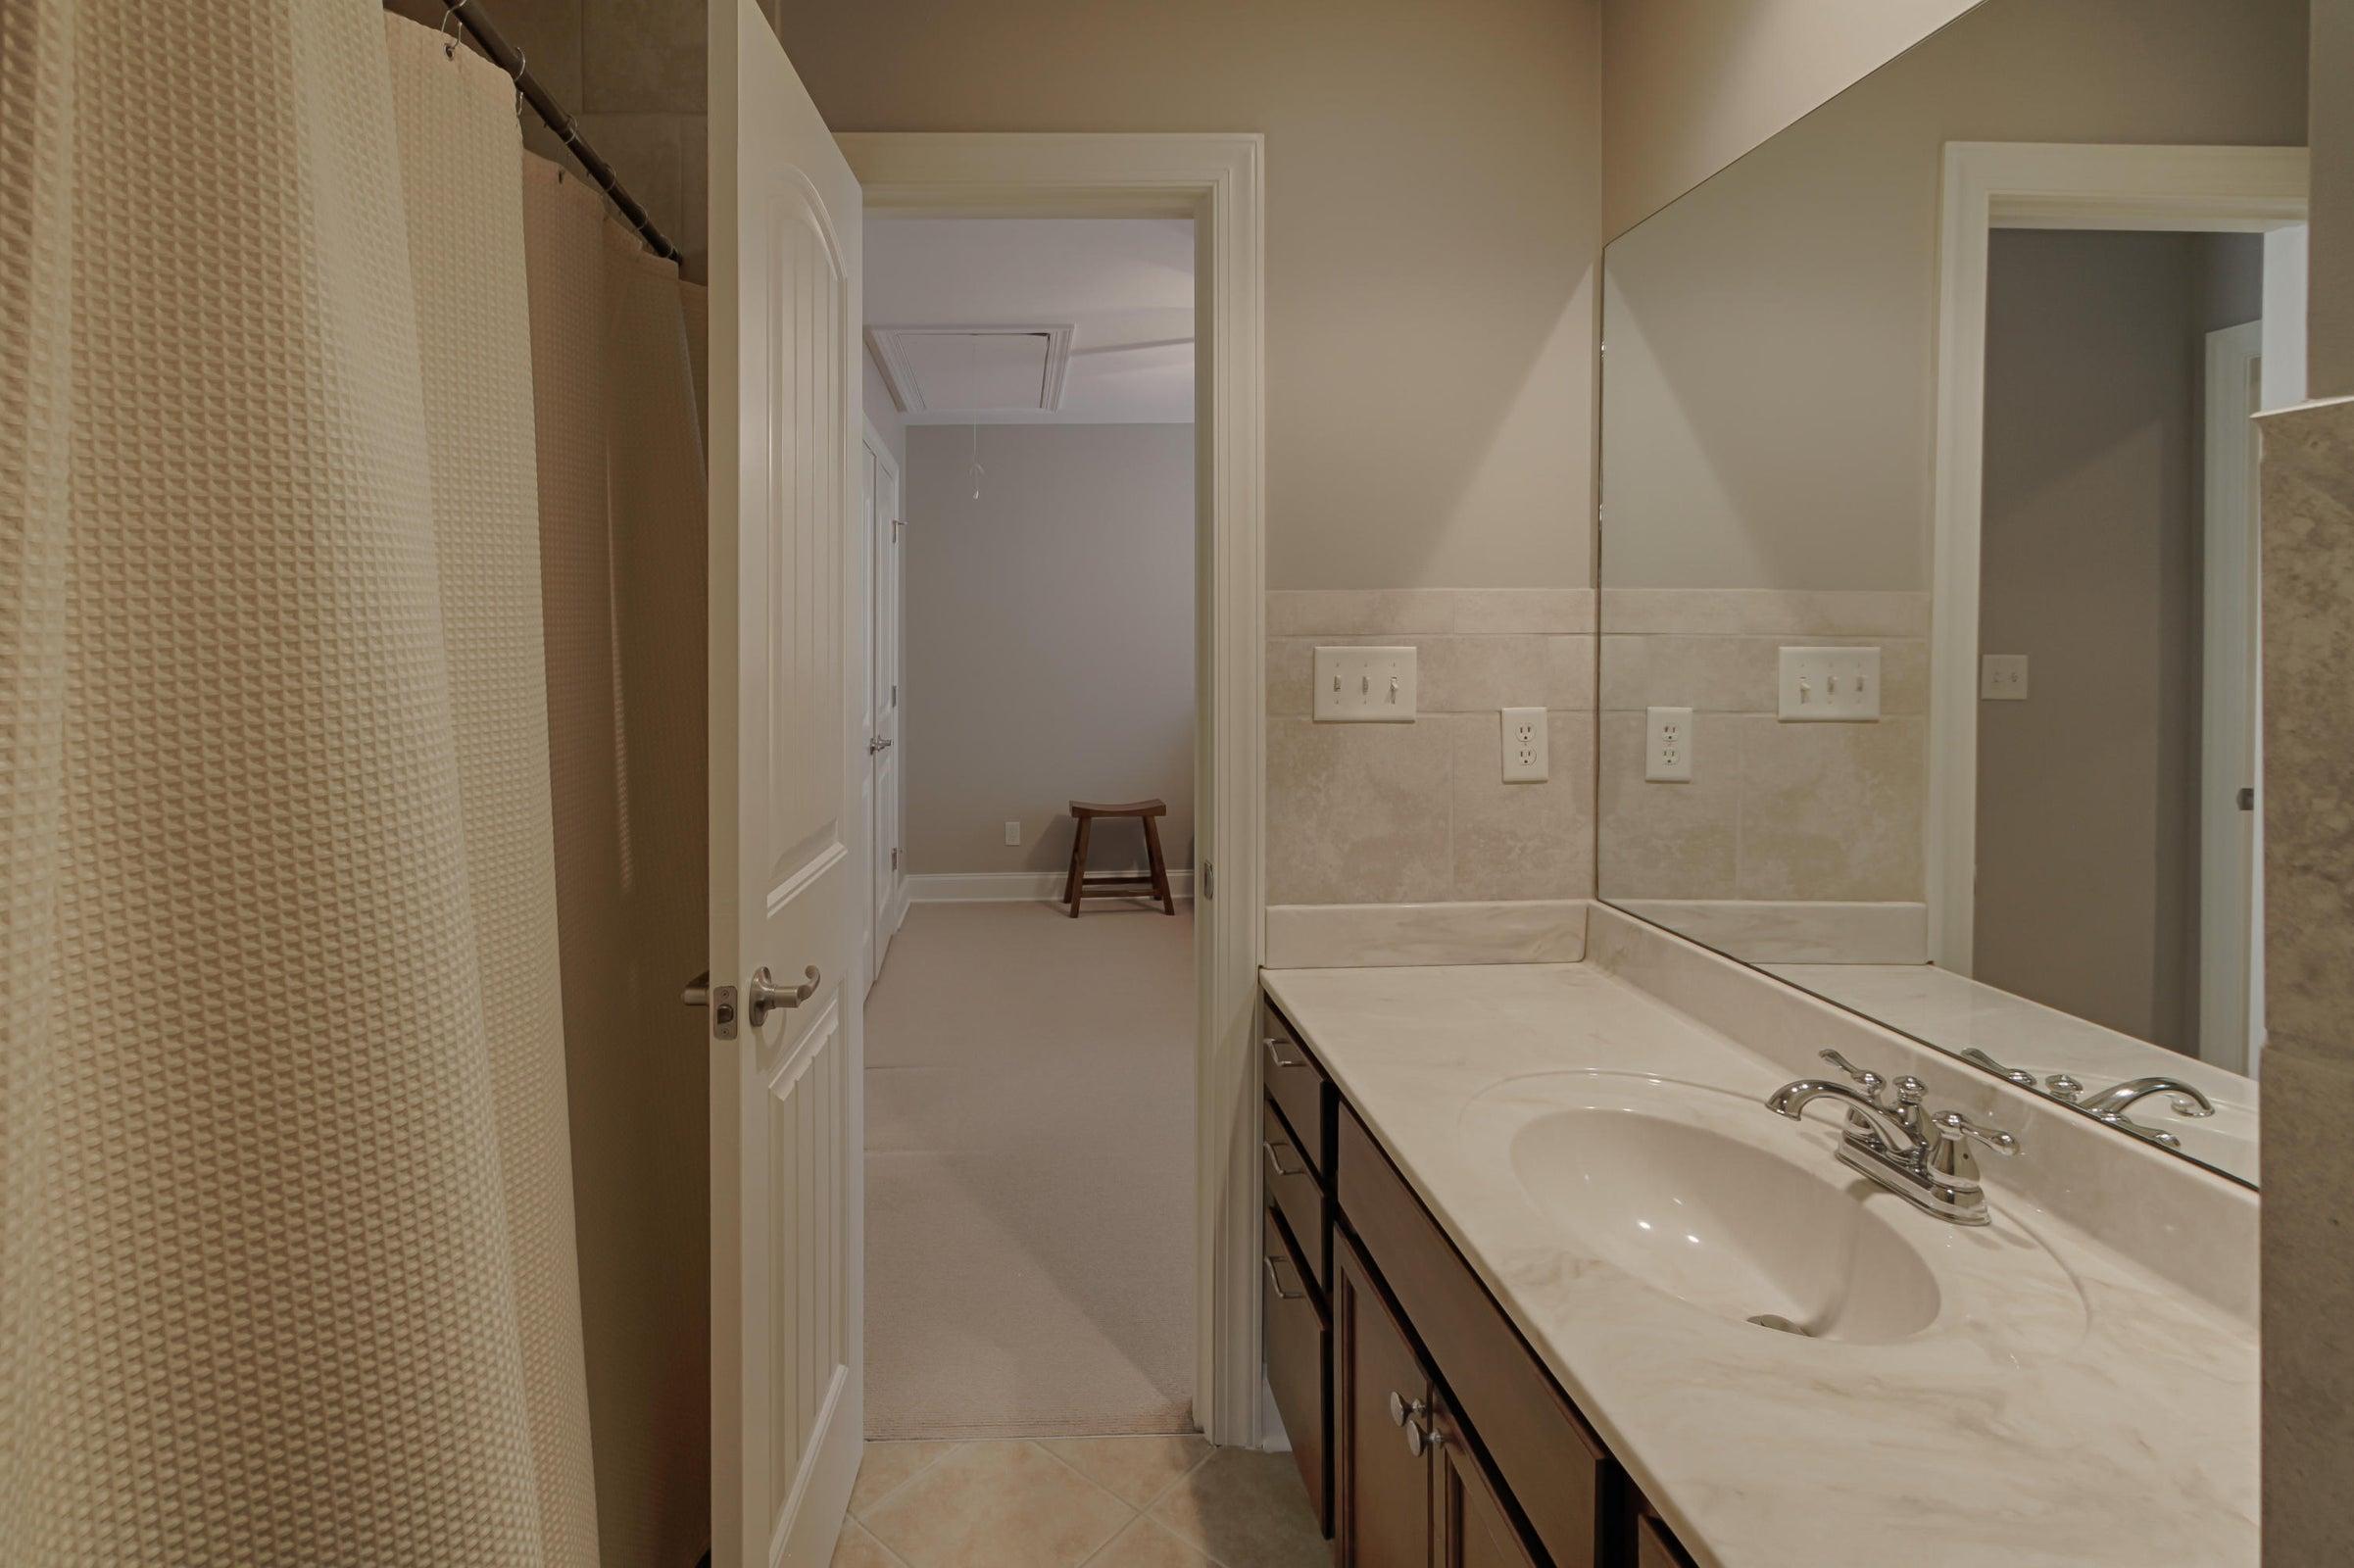 Second full bath upstairs